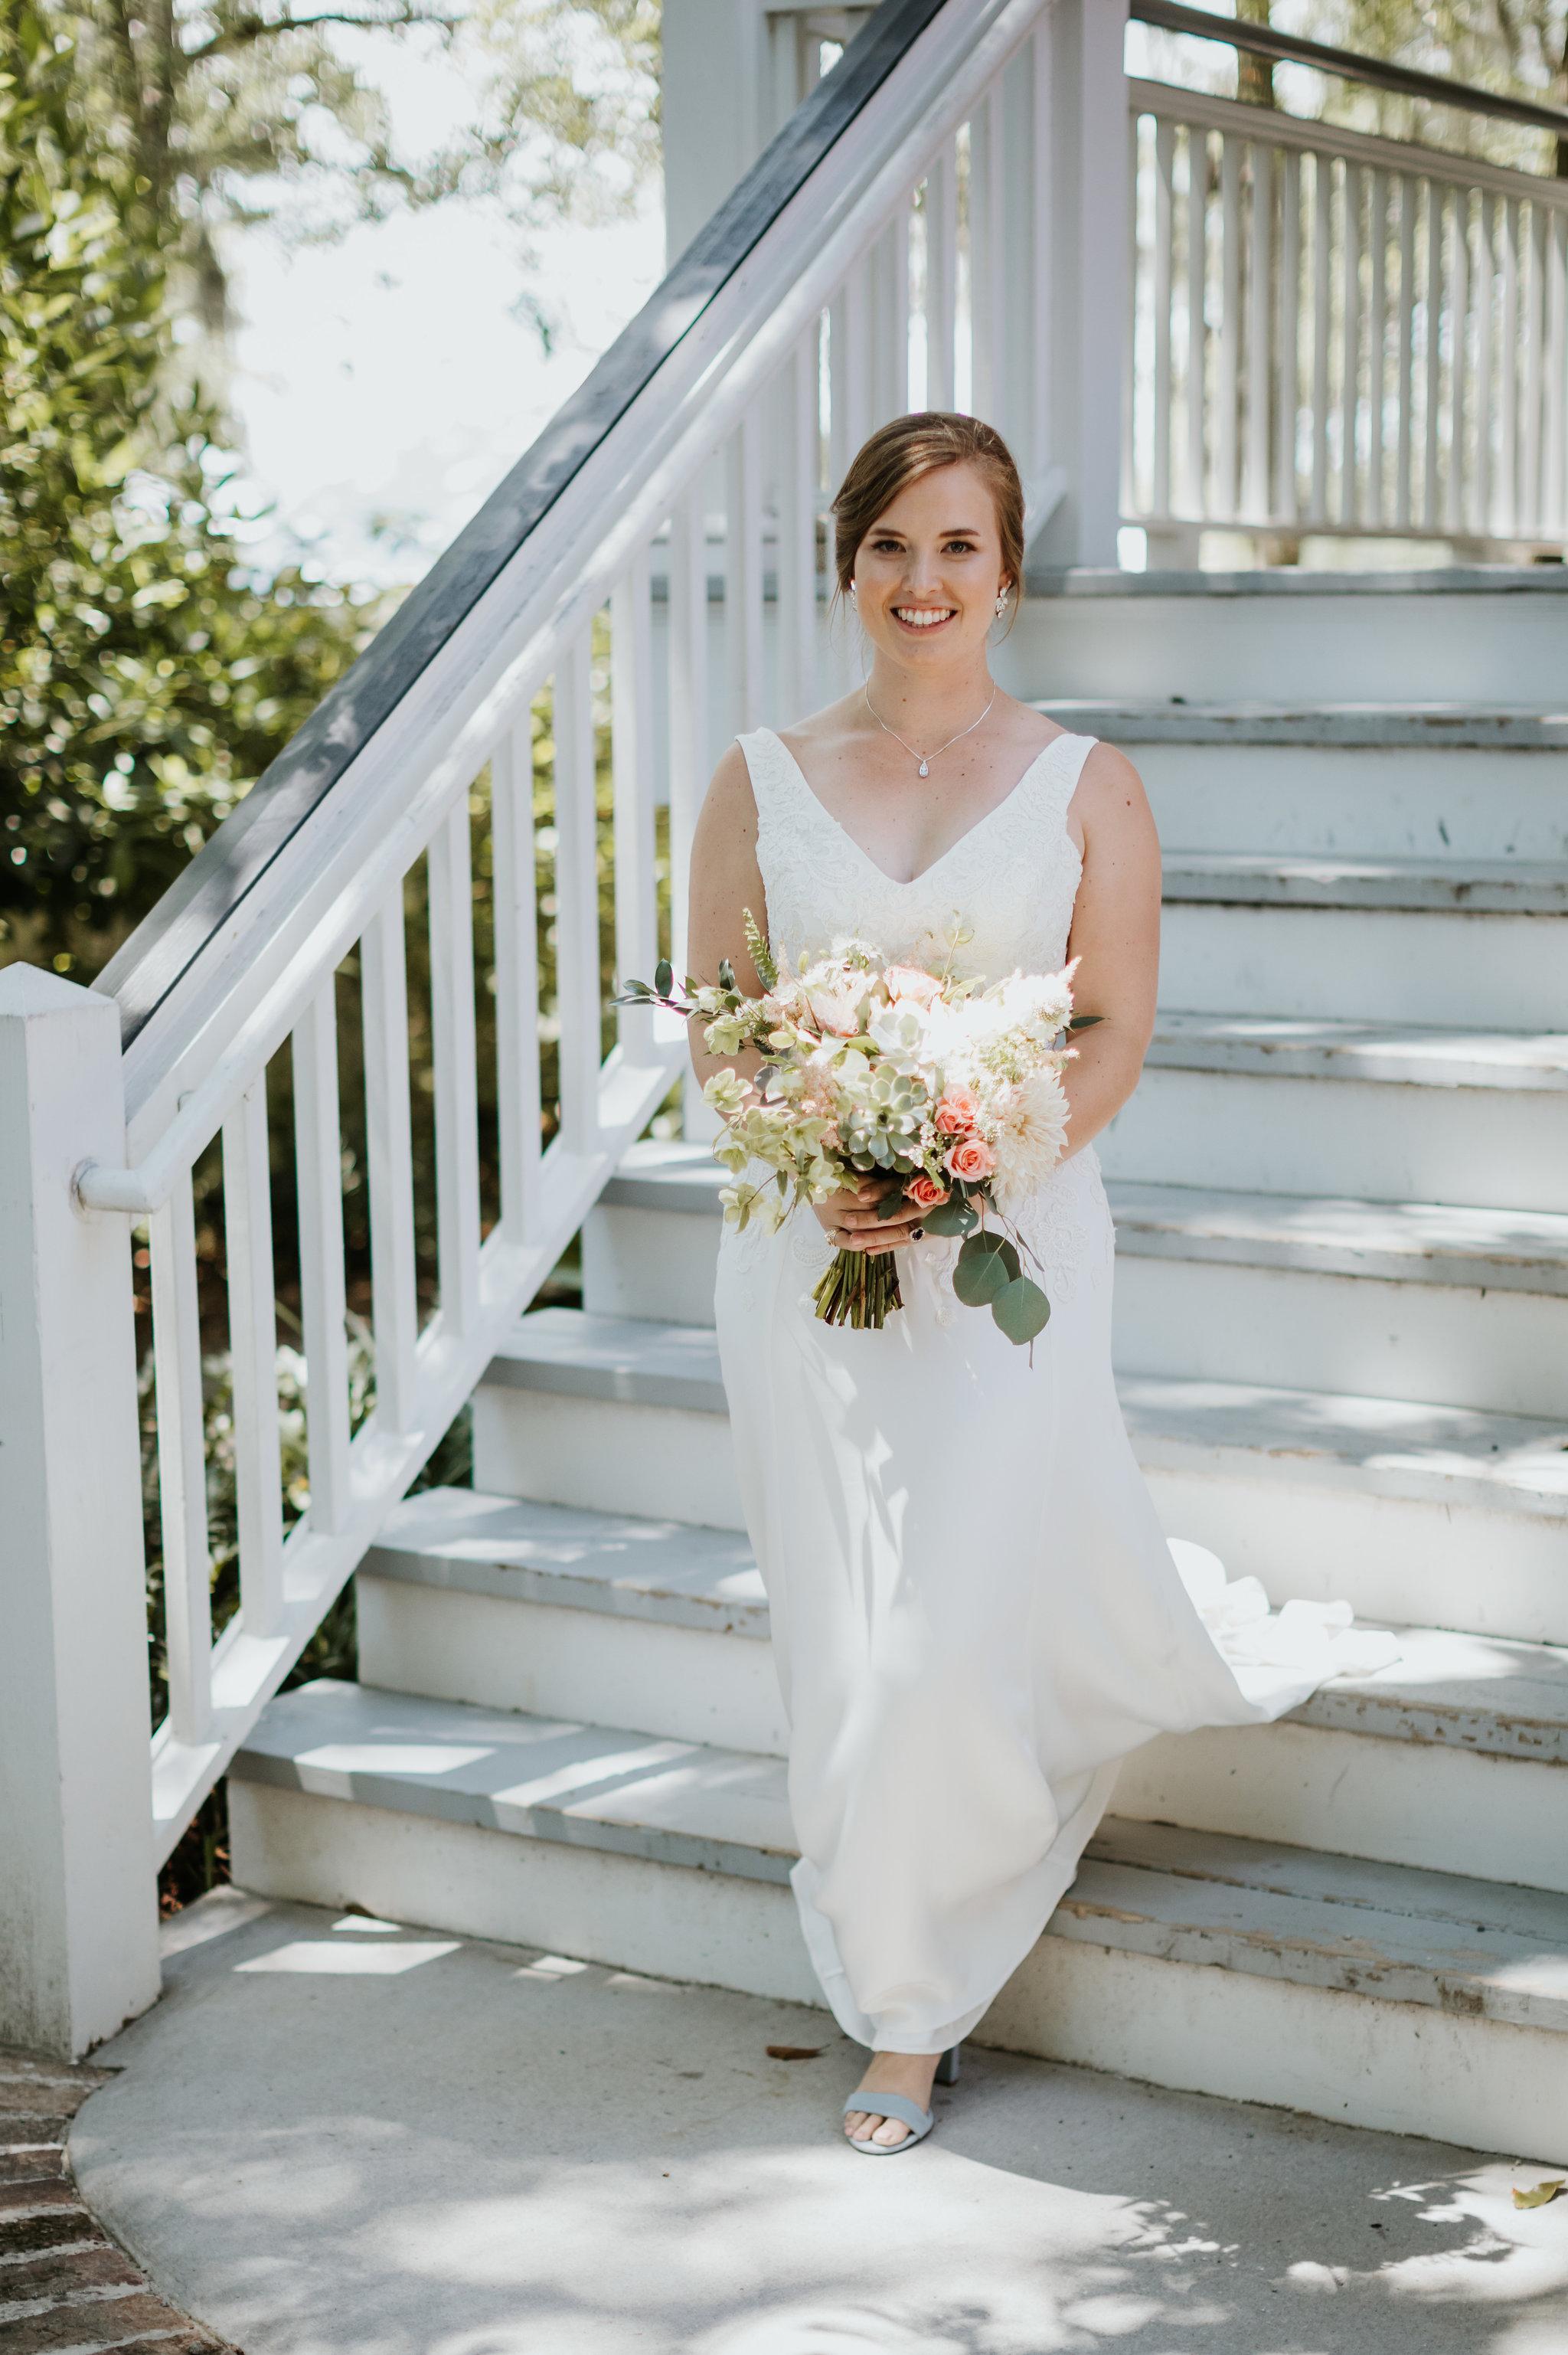 Creekclub-at-Ion-Charleston-SC-wedding-portrait-photographer-254.jpg